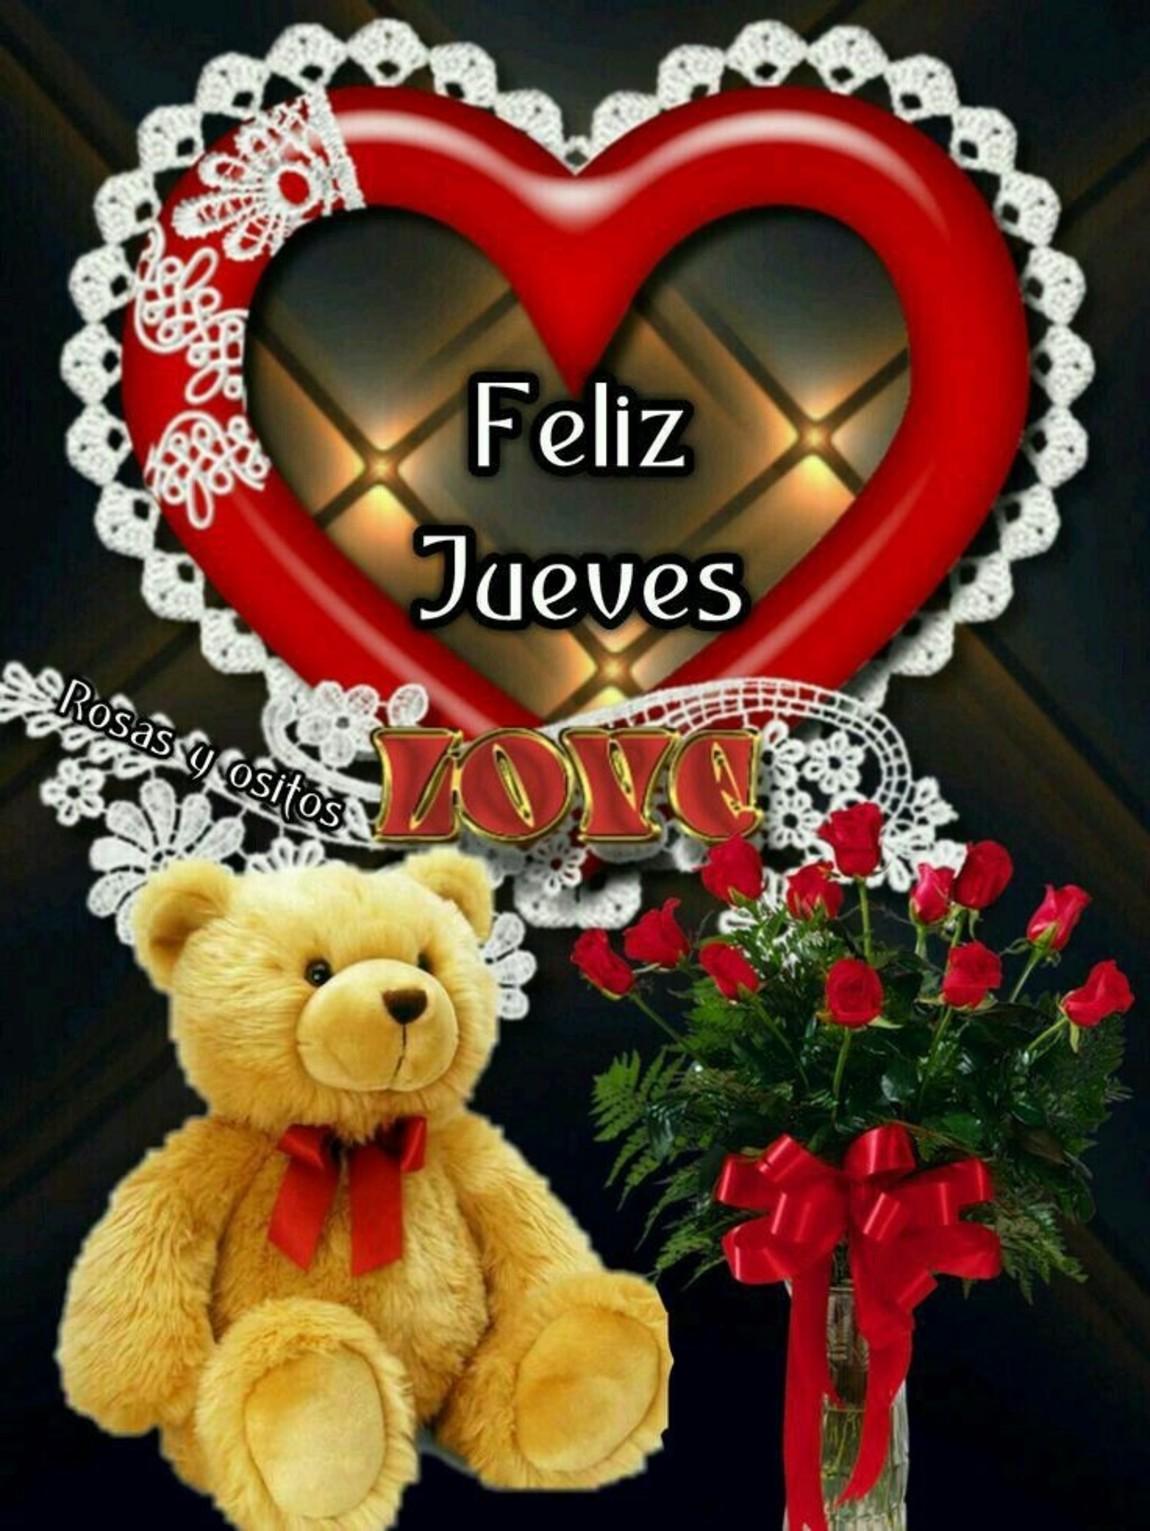 Feliz Jueves Mi Amor Imagenes Bonitasimagenes Net